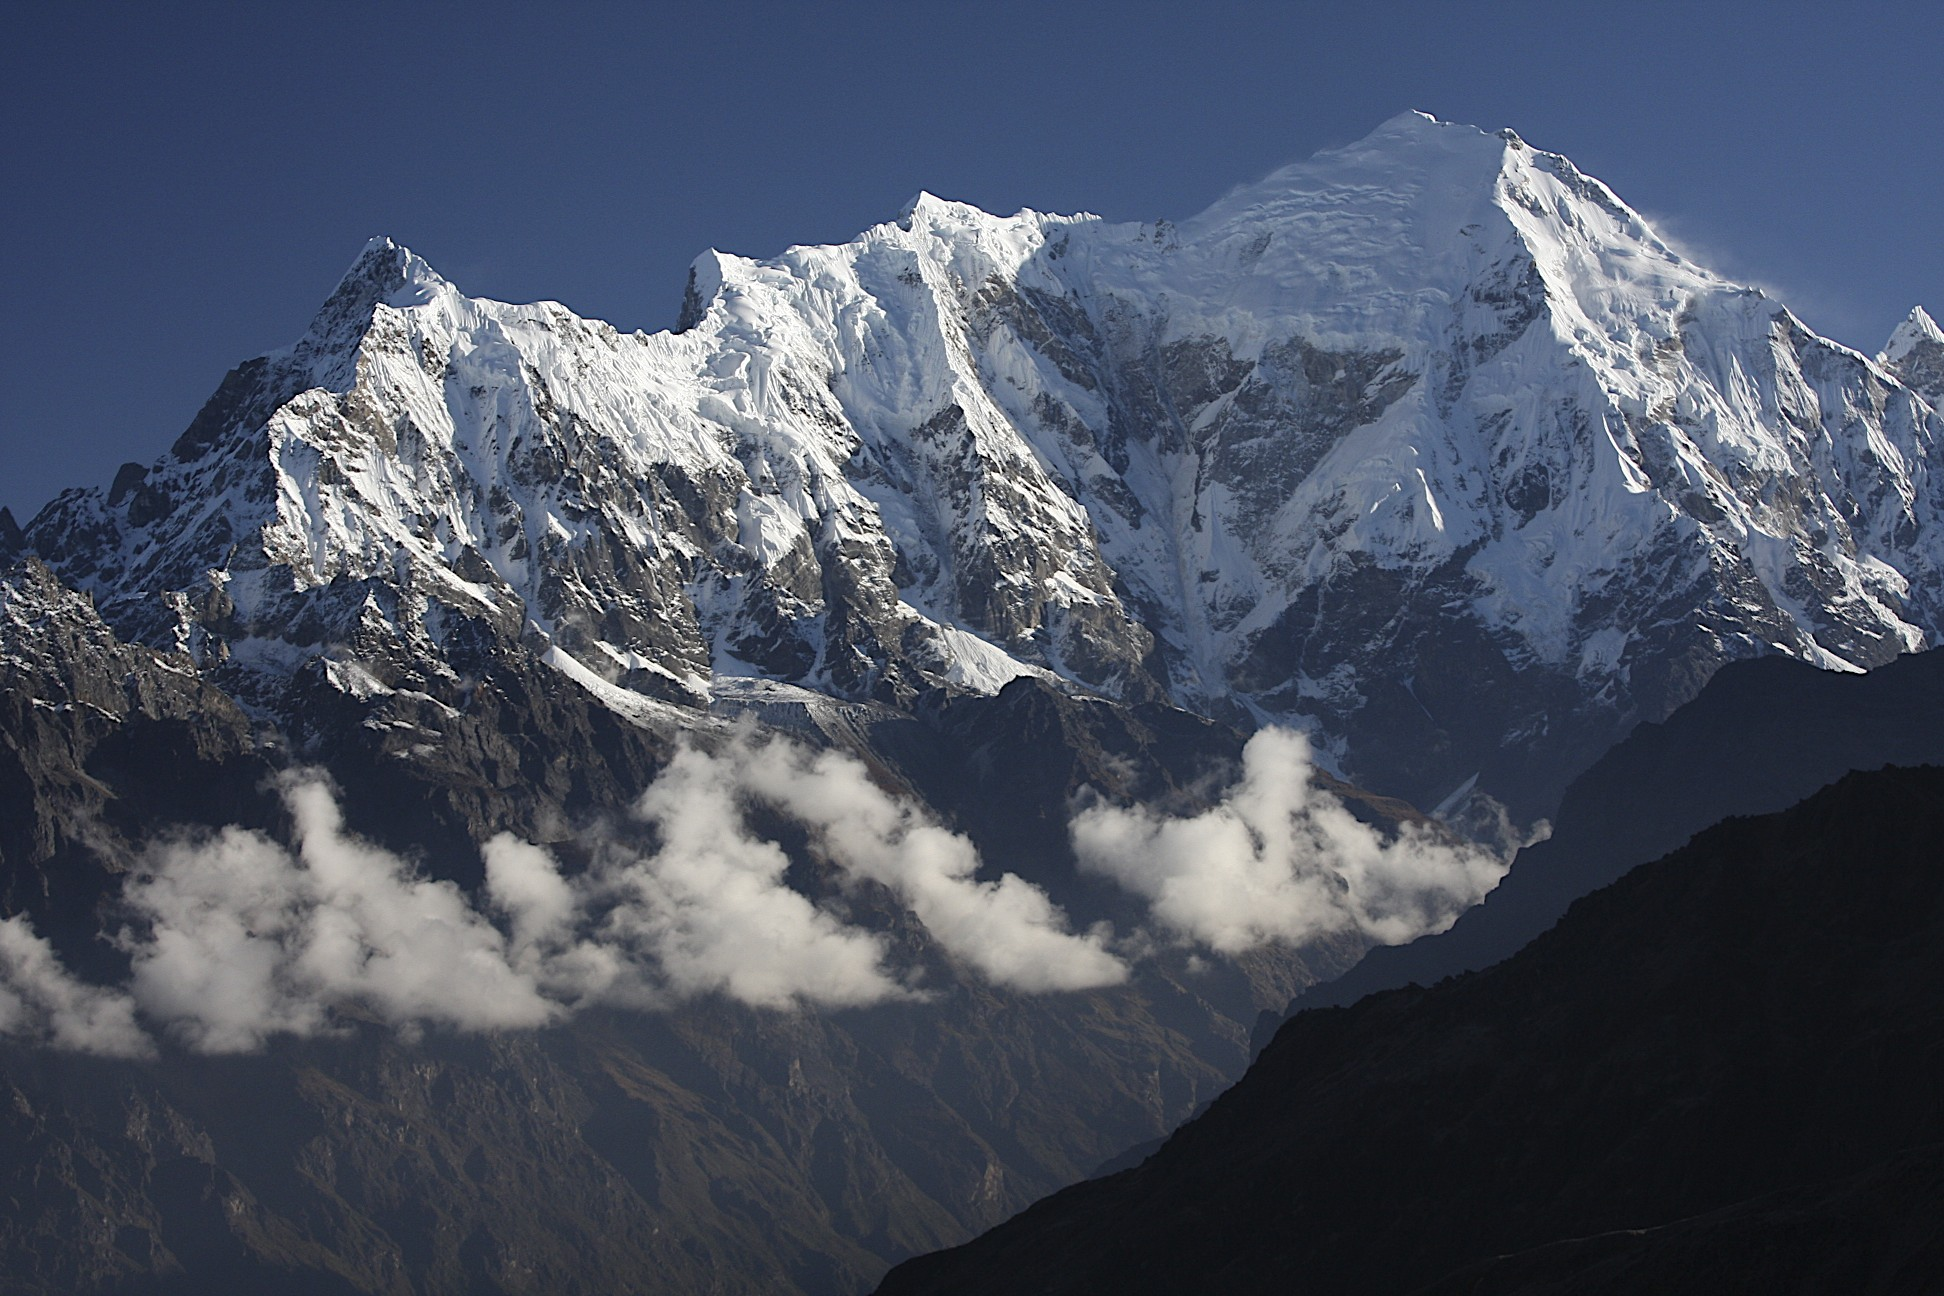 Langtang II 6,596m (left) and Langtang Lirung 7,227m (right)